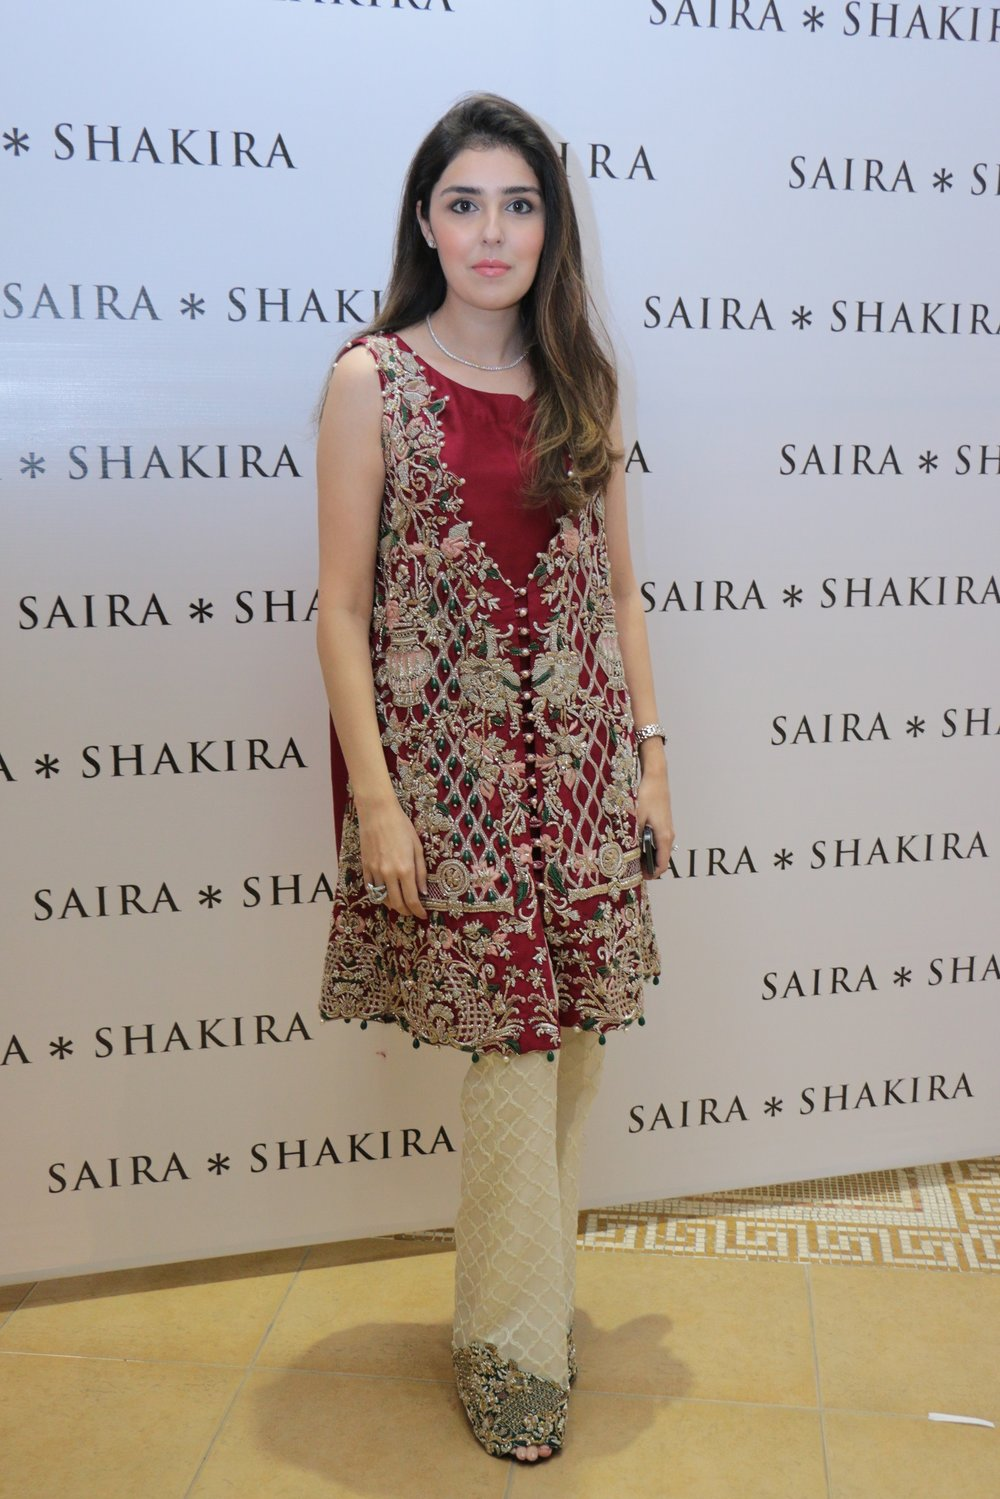 Zehra Qizilbash wearing Saira Shakira-1.jpg